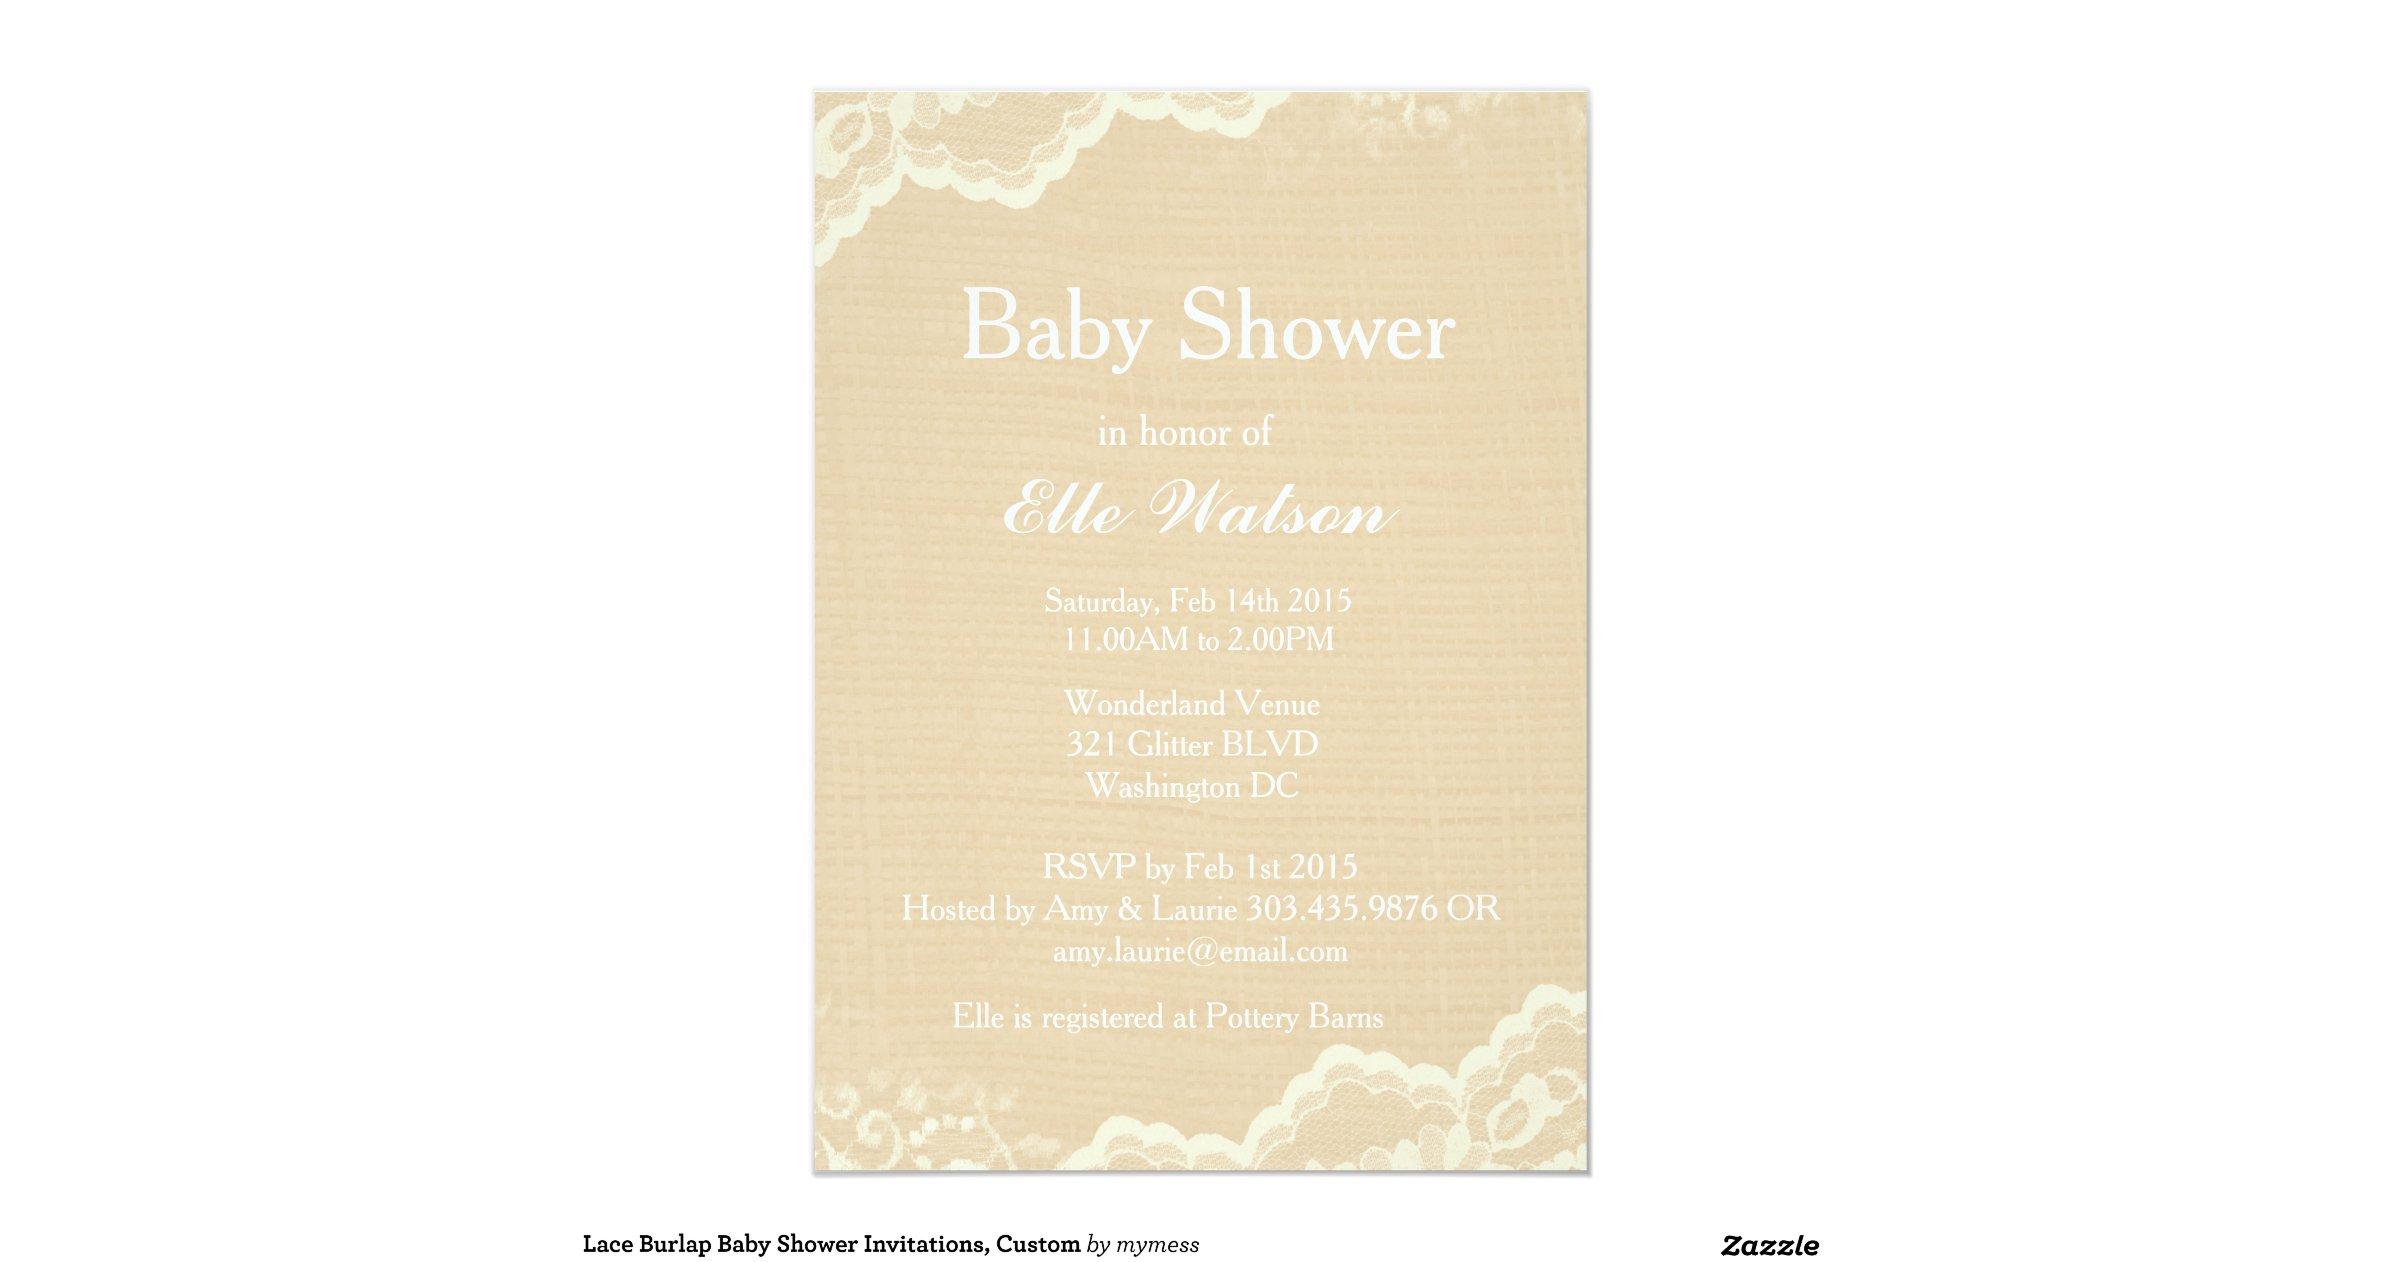 lace burlap baby shower invitations custom 5x7 paper invitation card